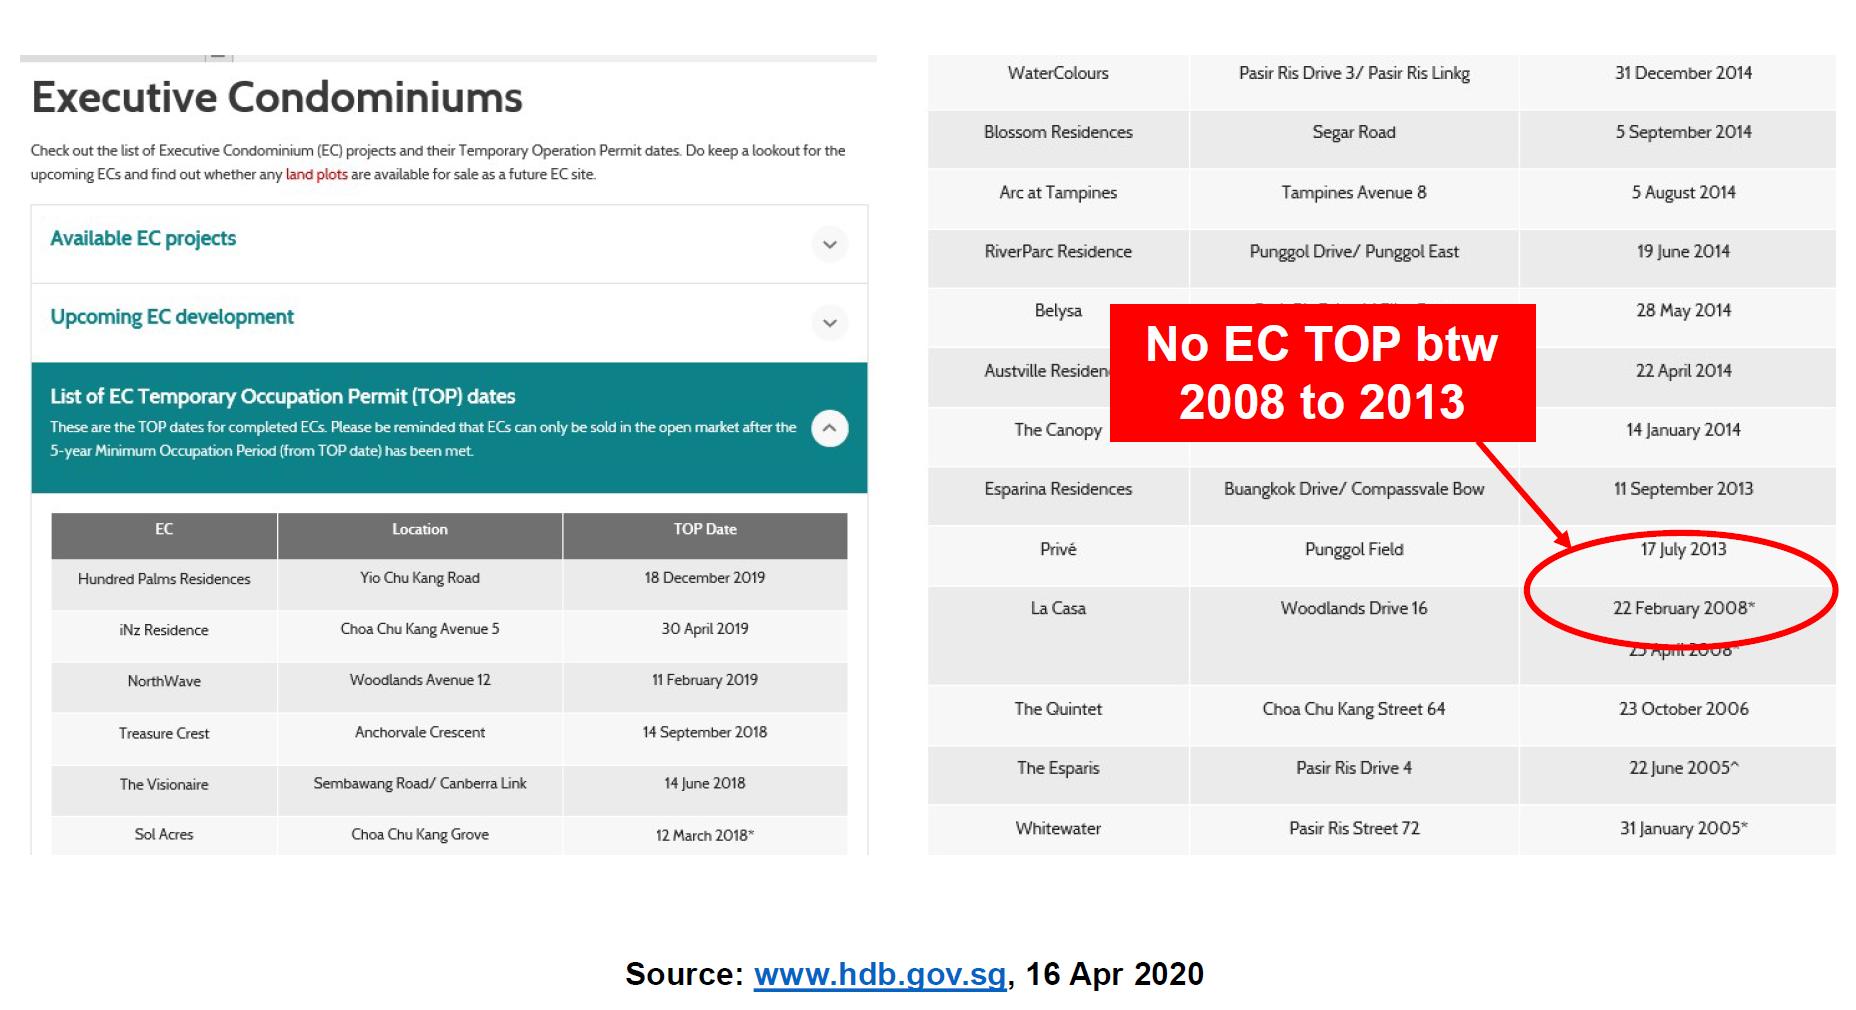 No EC Top in 2008 to 2013